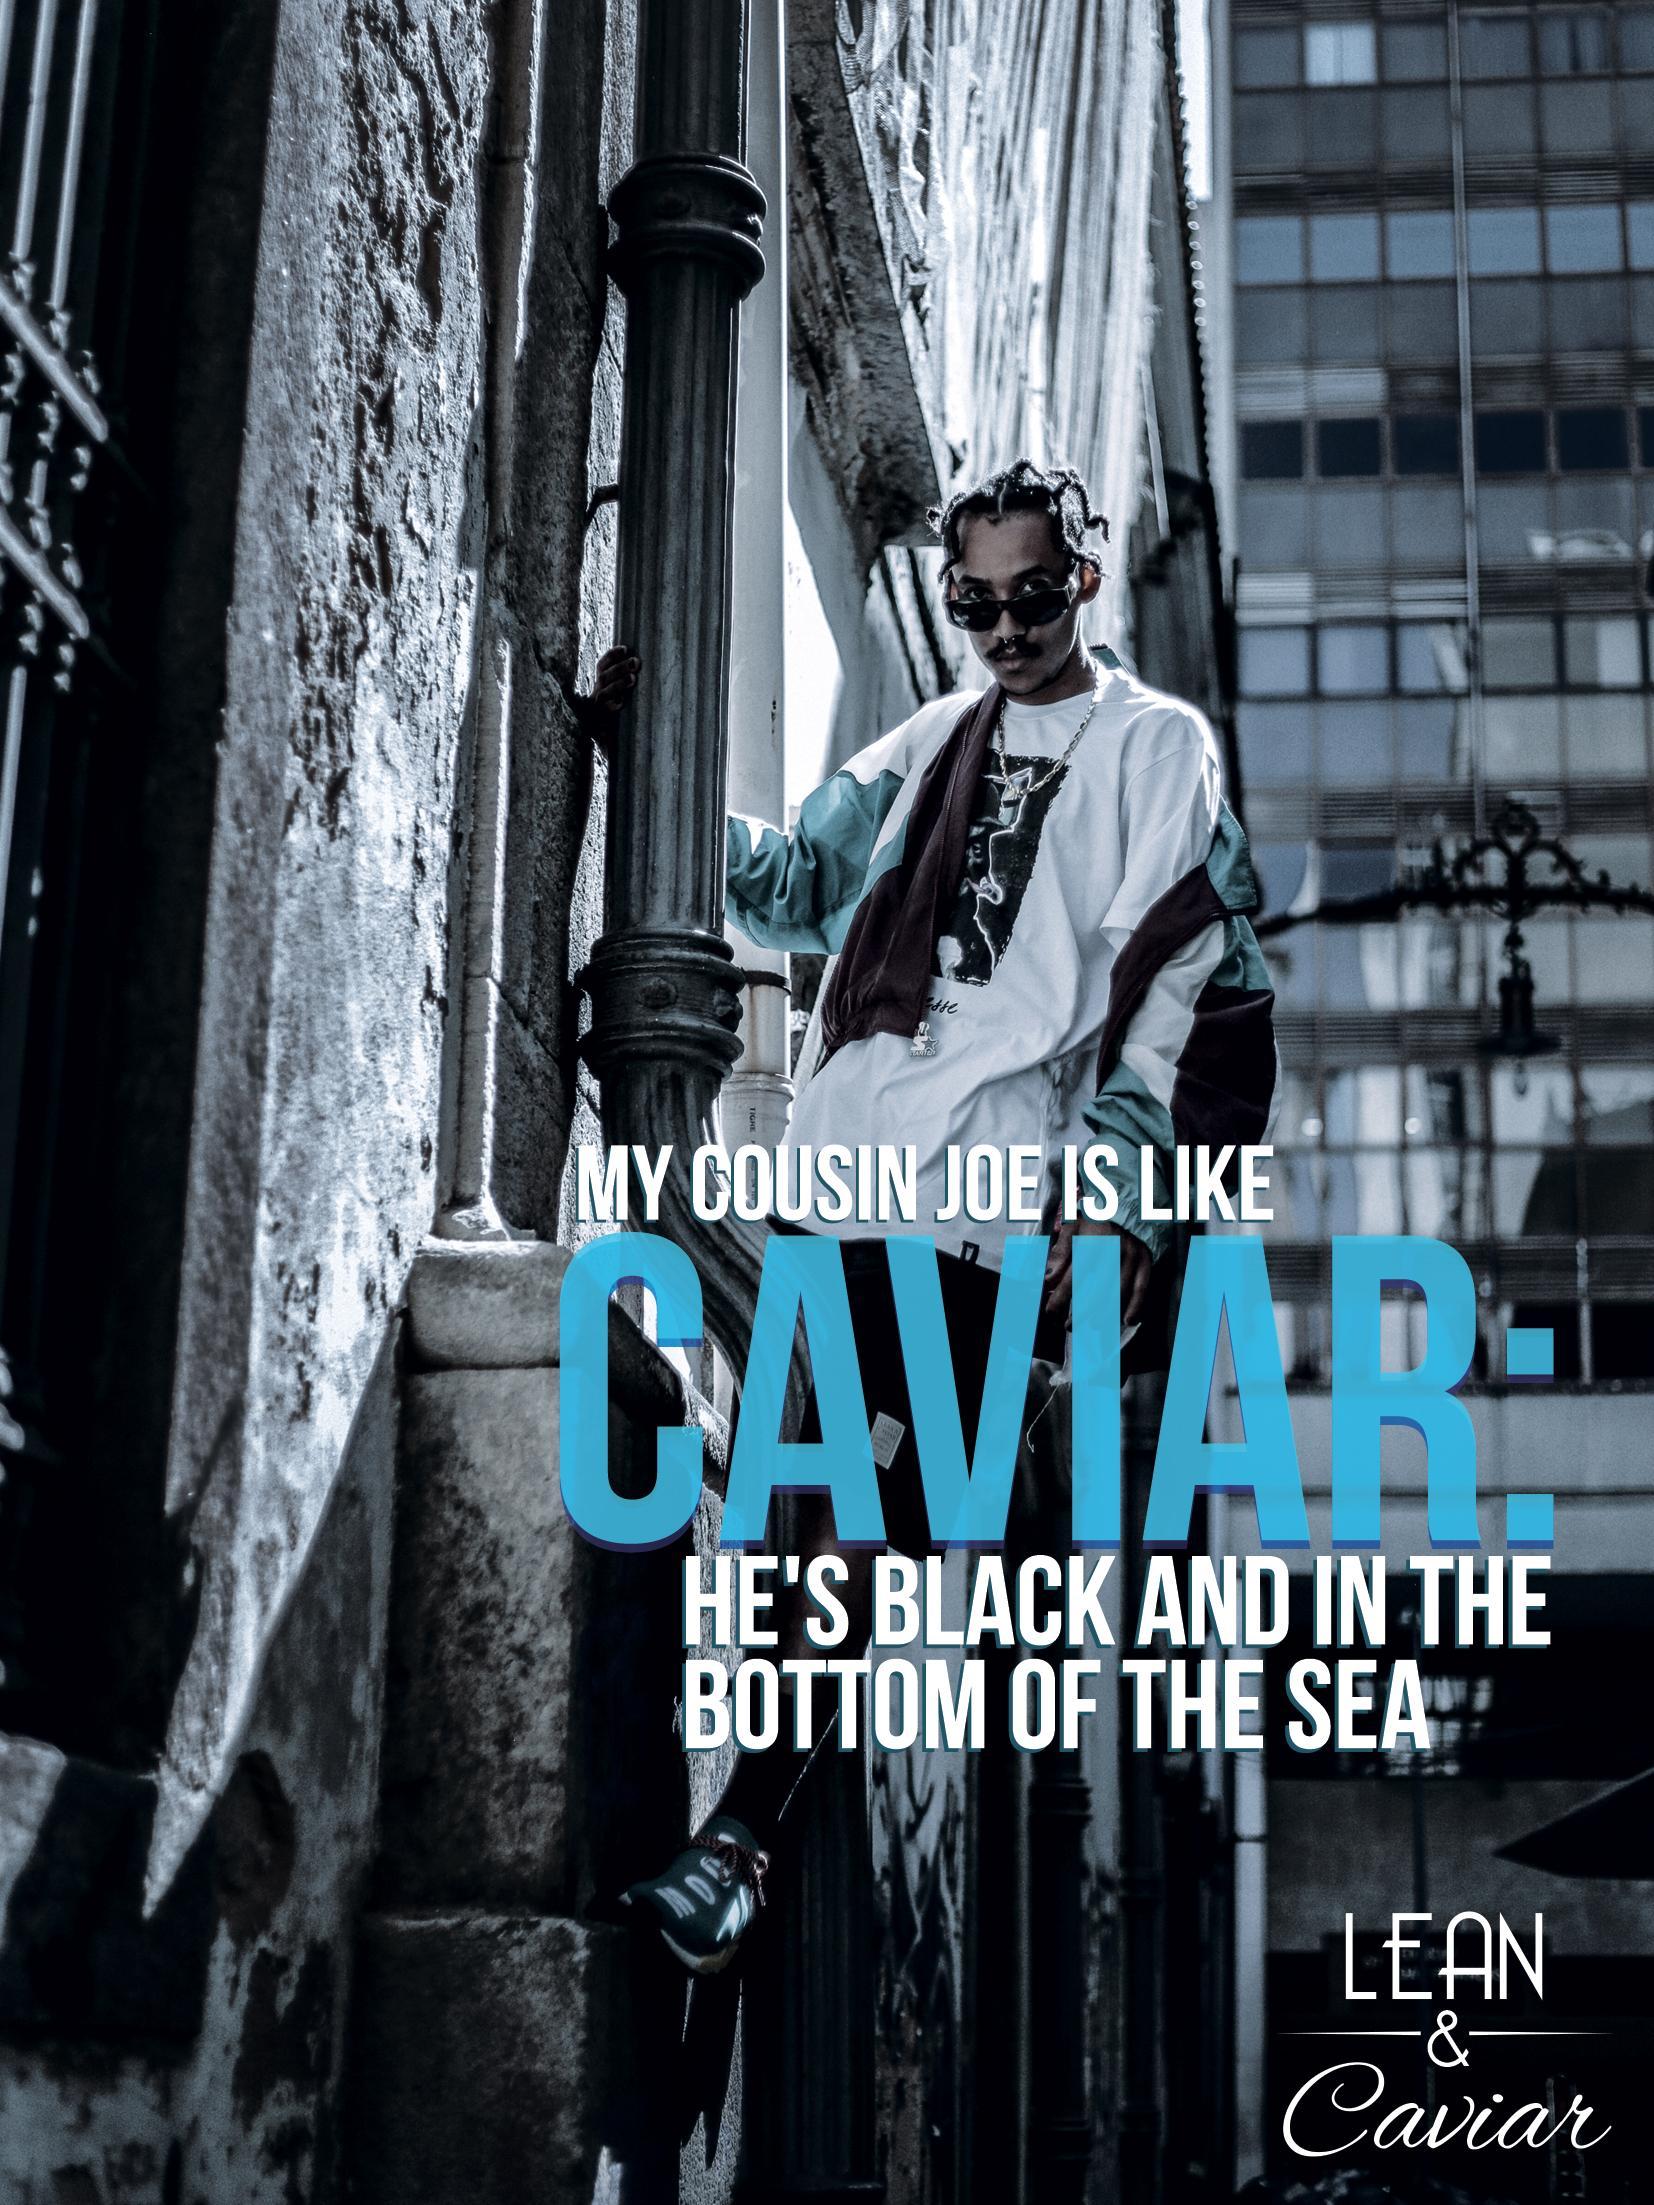 Lean & Caviar Print Ad - 2017 Streetwear Collection, 1